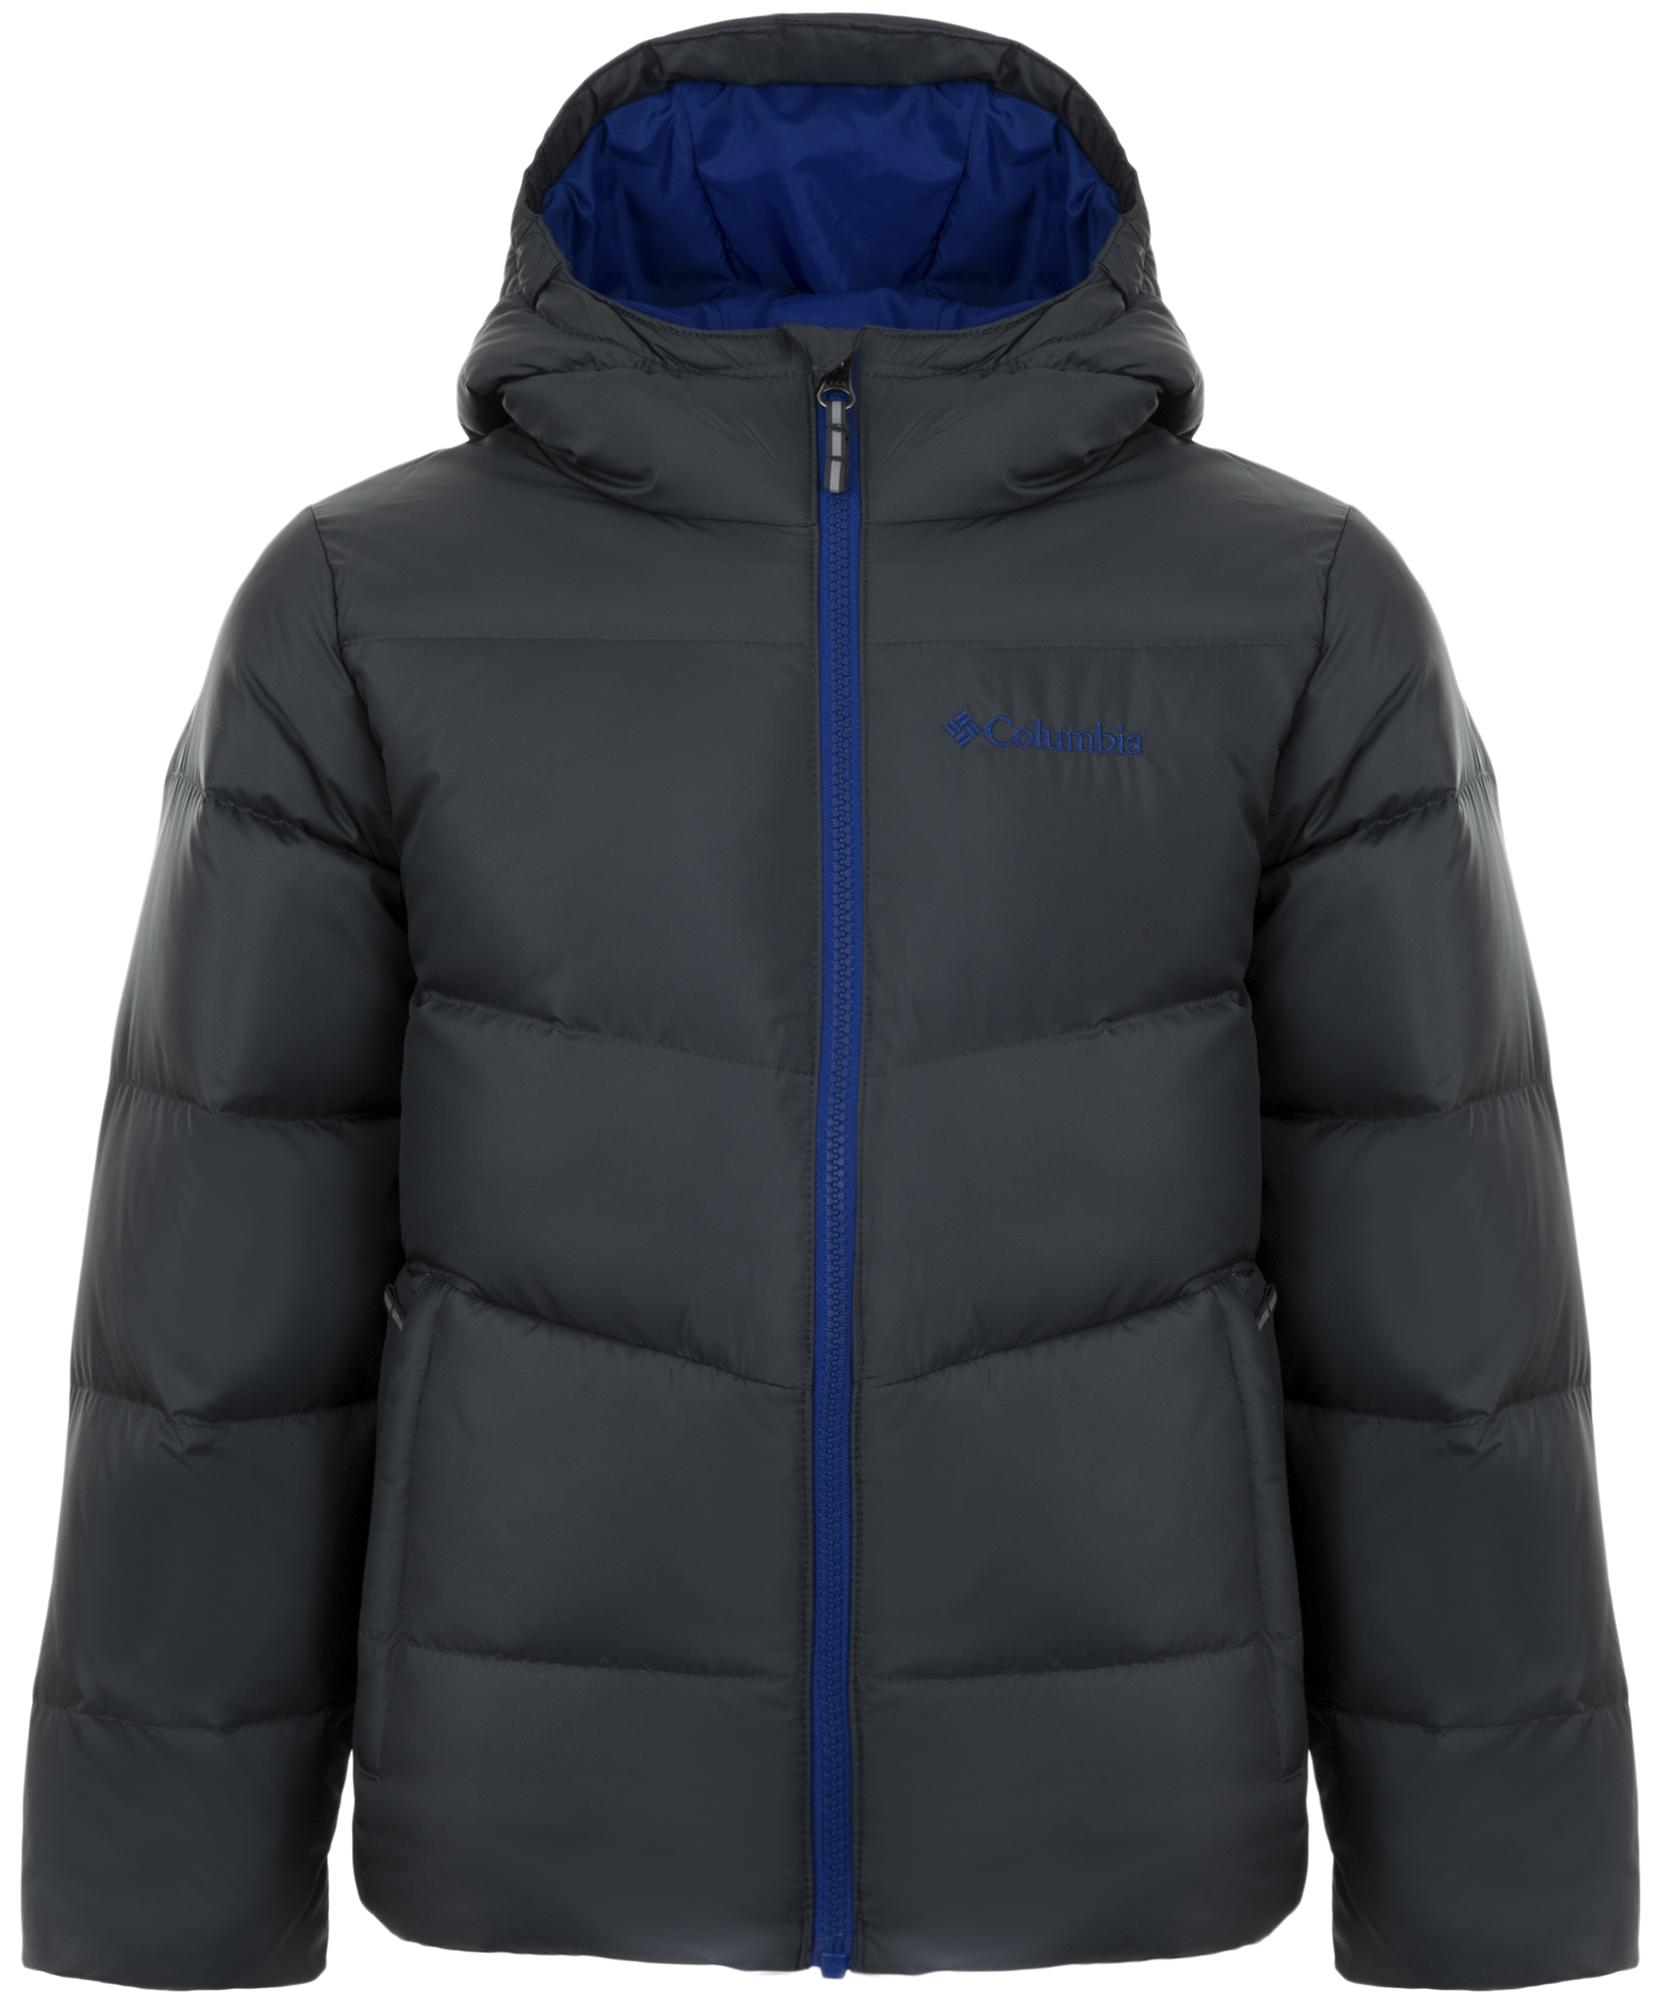 Columbia Куртка пуховая для мальчиков Columbia Space Heater II, размер 160-170 цена